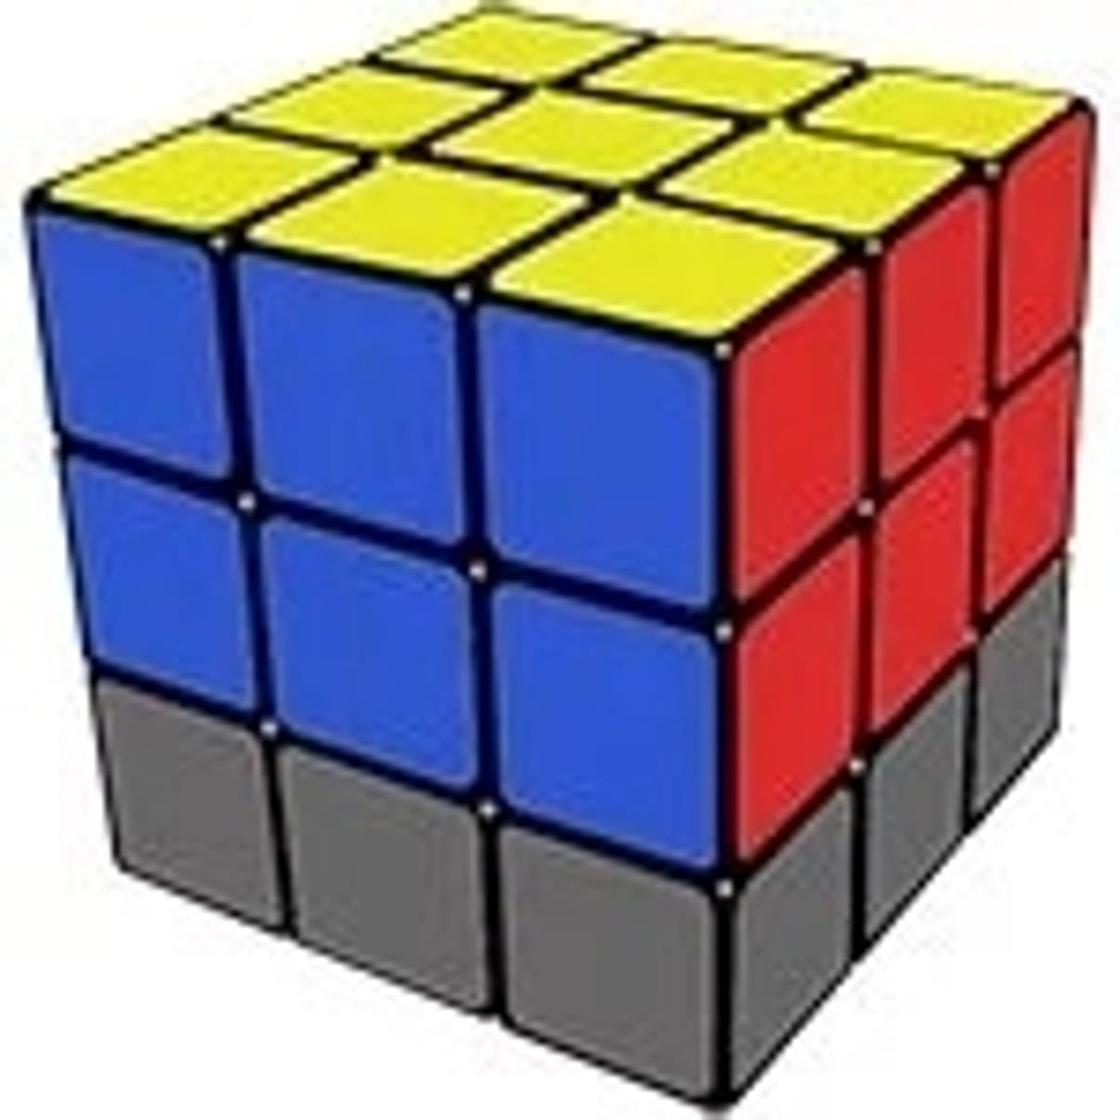 Сборка среднего слоя кубика Рубика